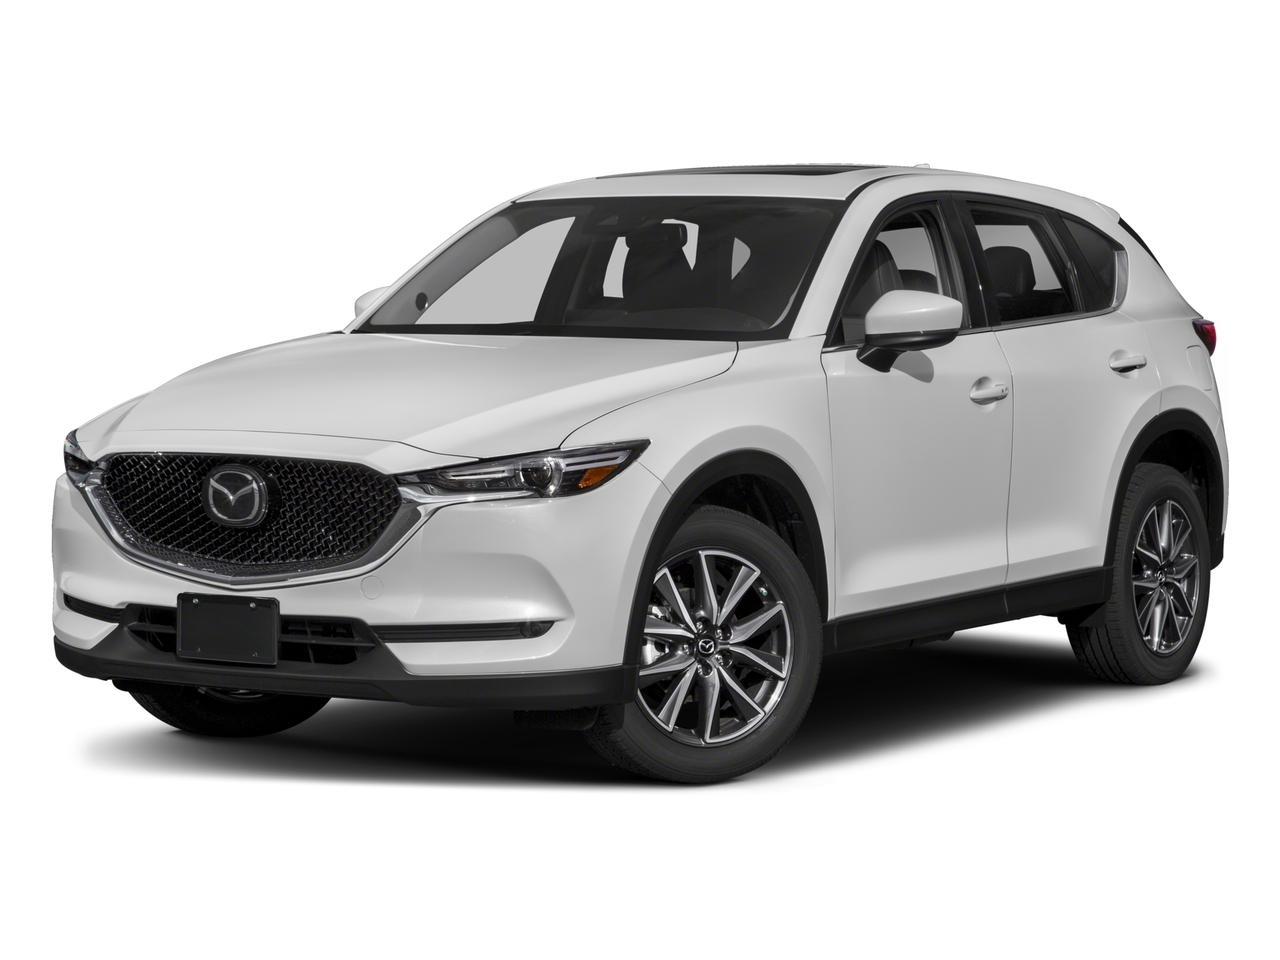 2018 Mazda CX-5 Vehicle Photo in WASILLA, AK 99654-8339